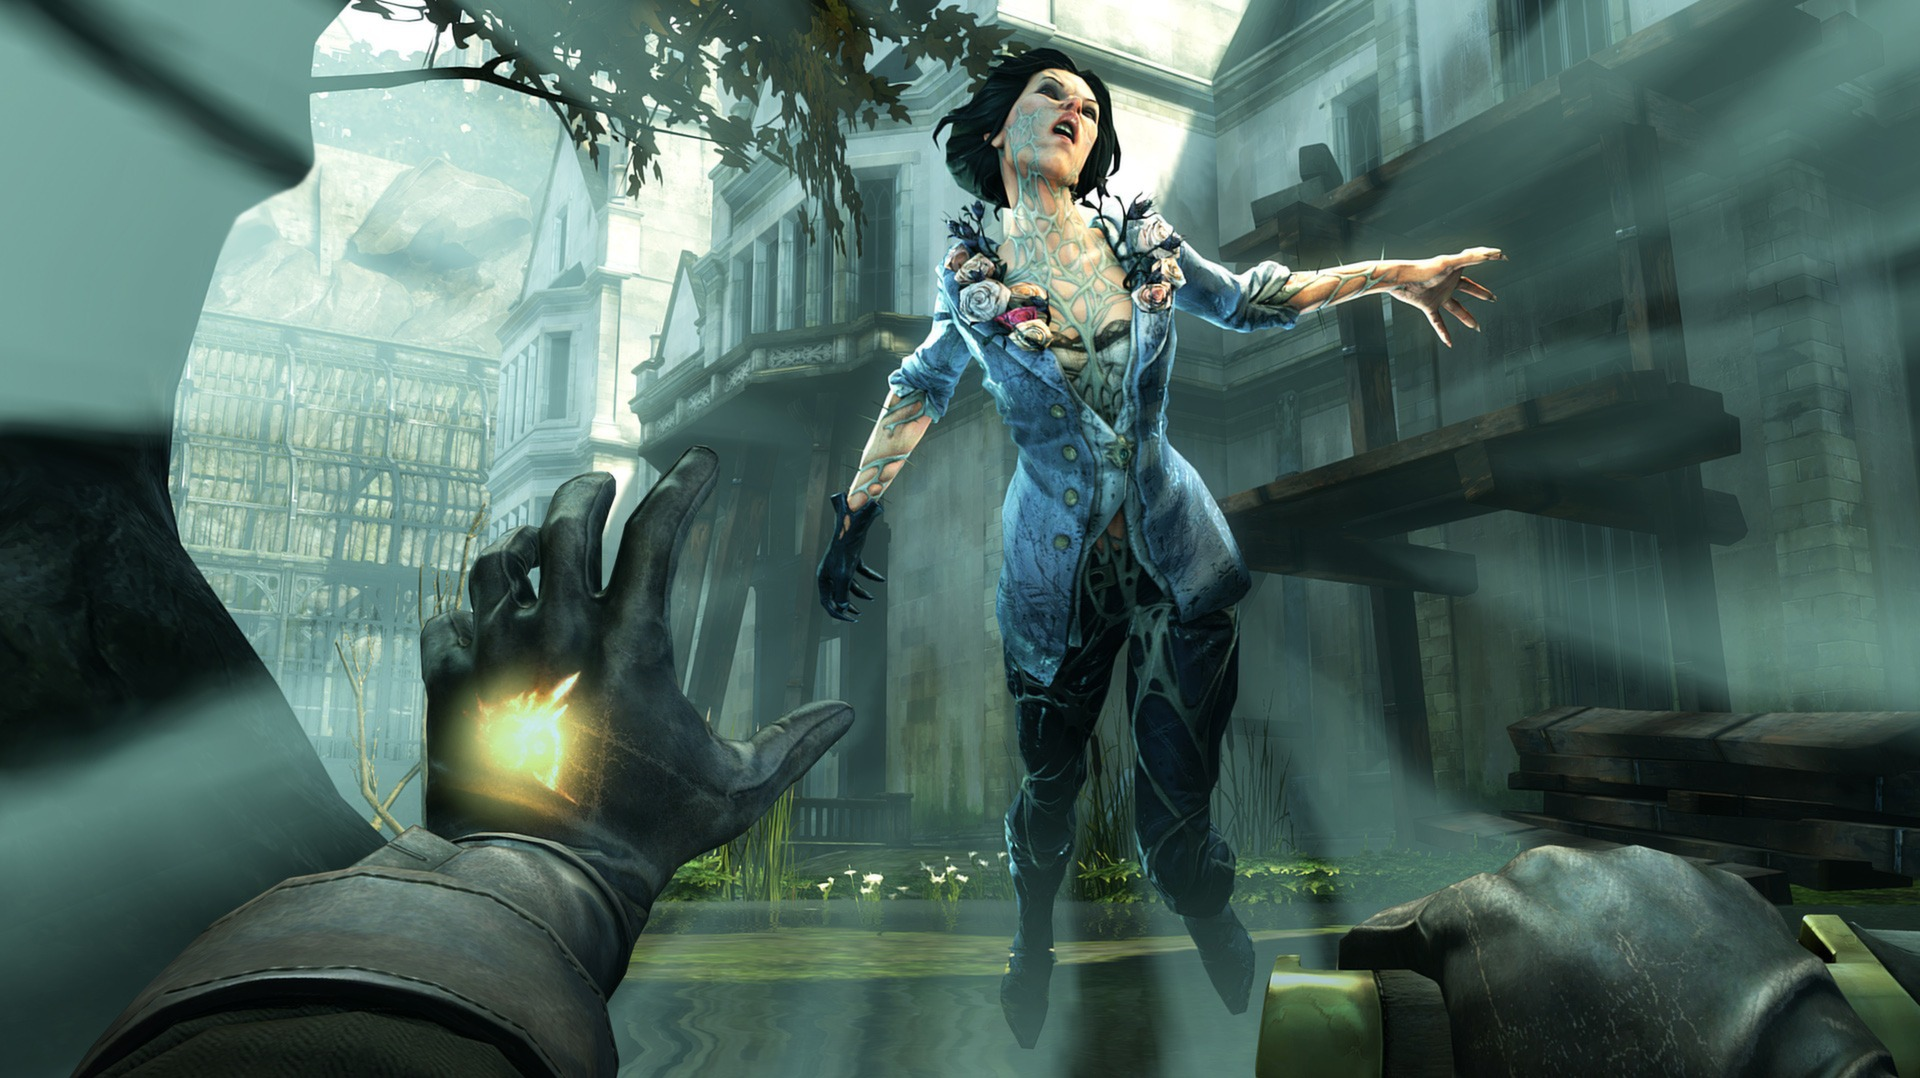 игра dishonored 3